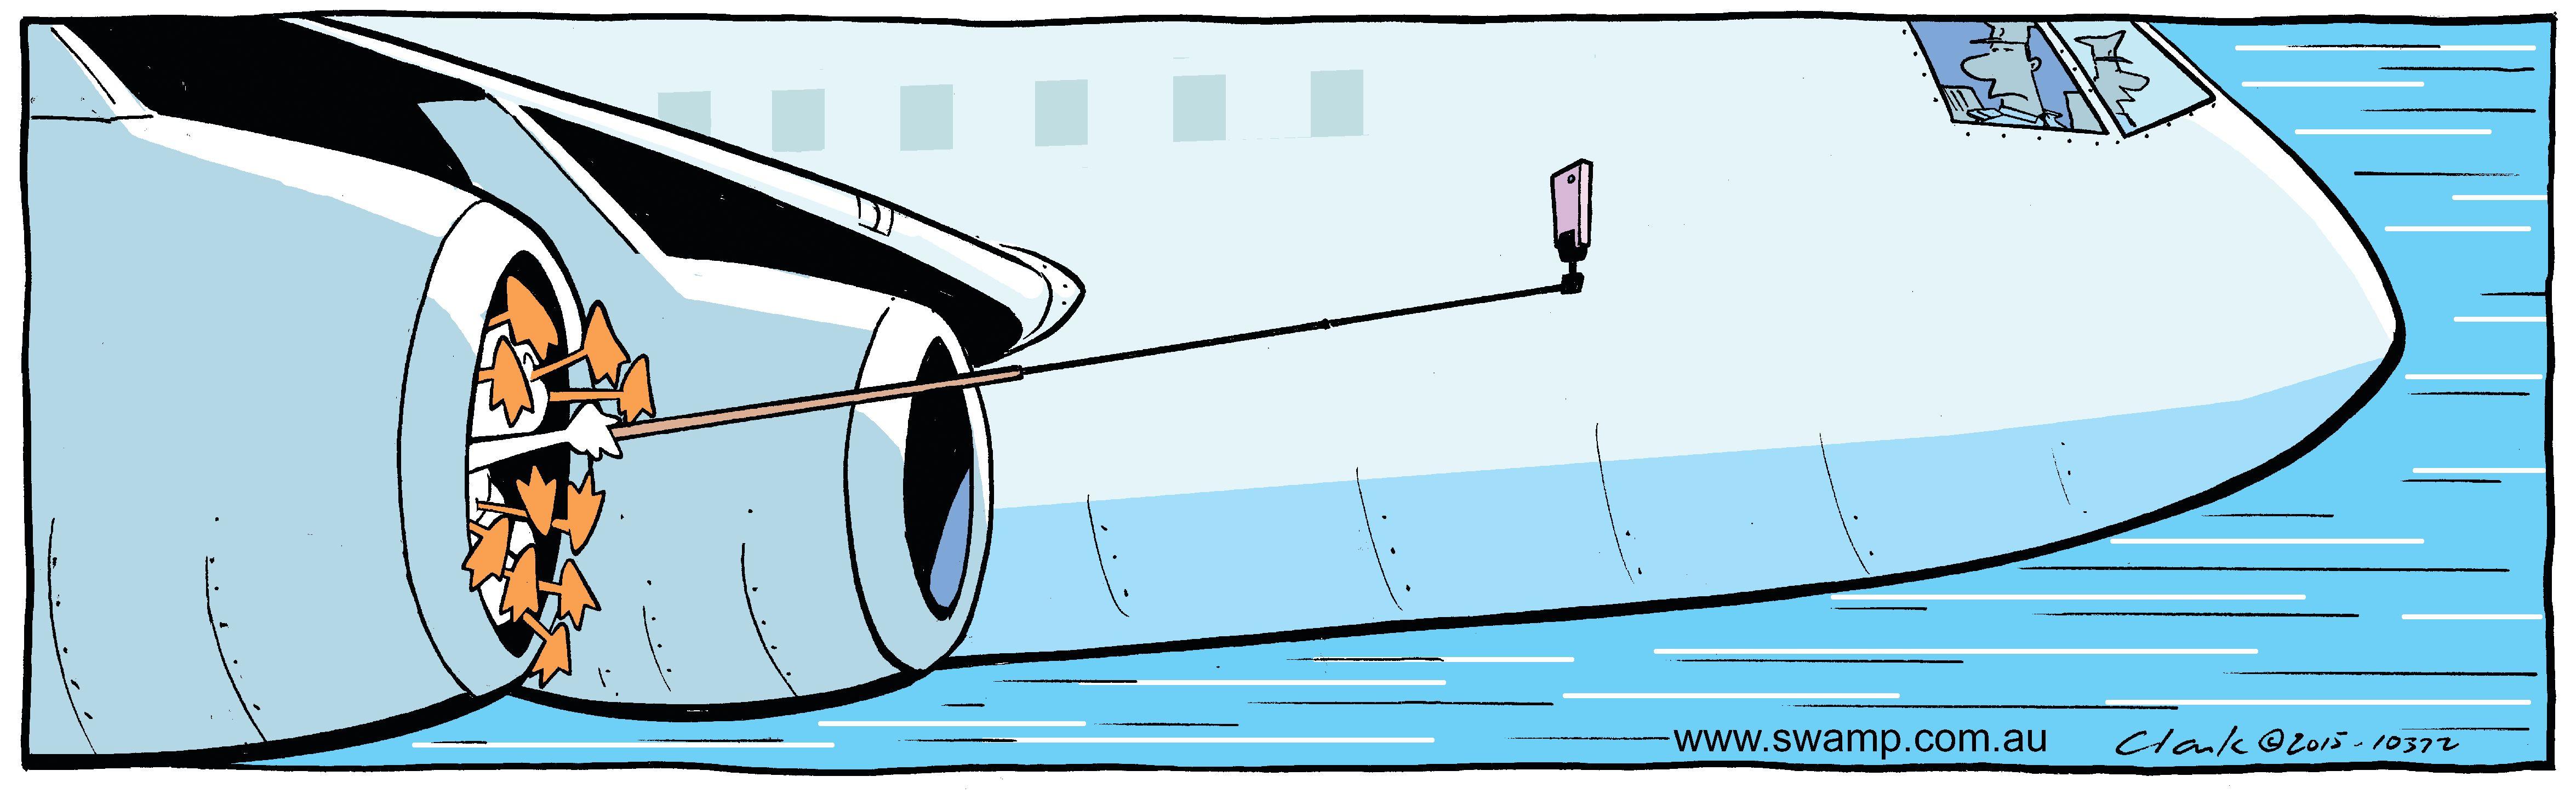 Birdstrike Selfie Comic